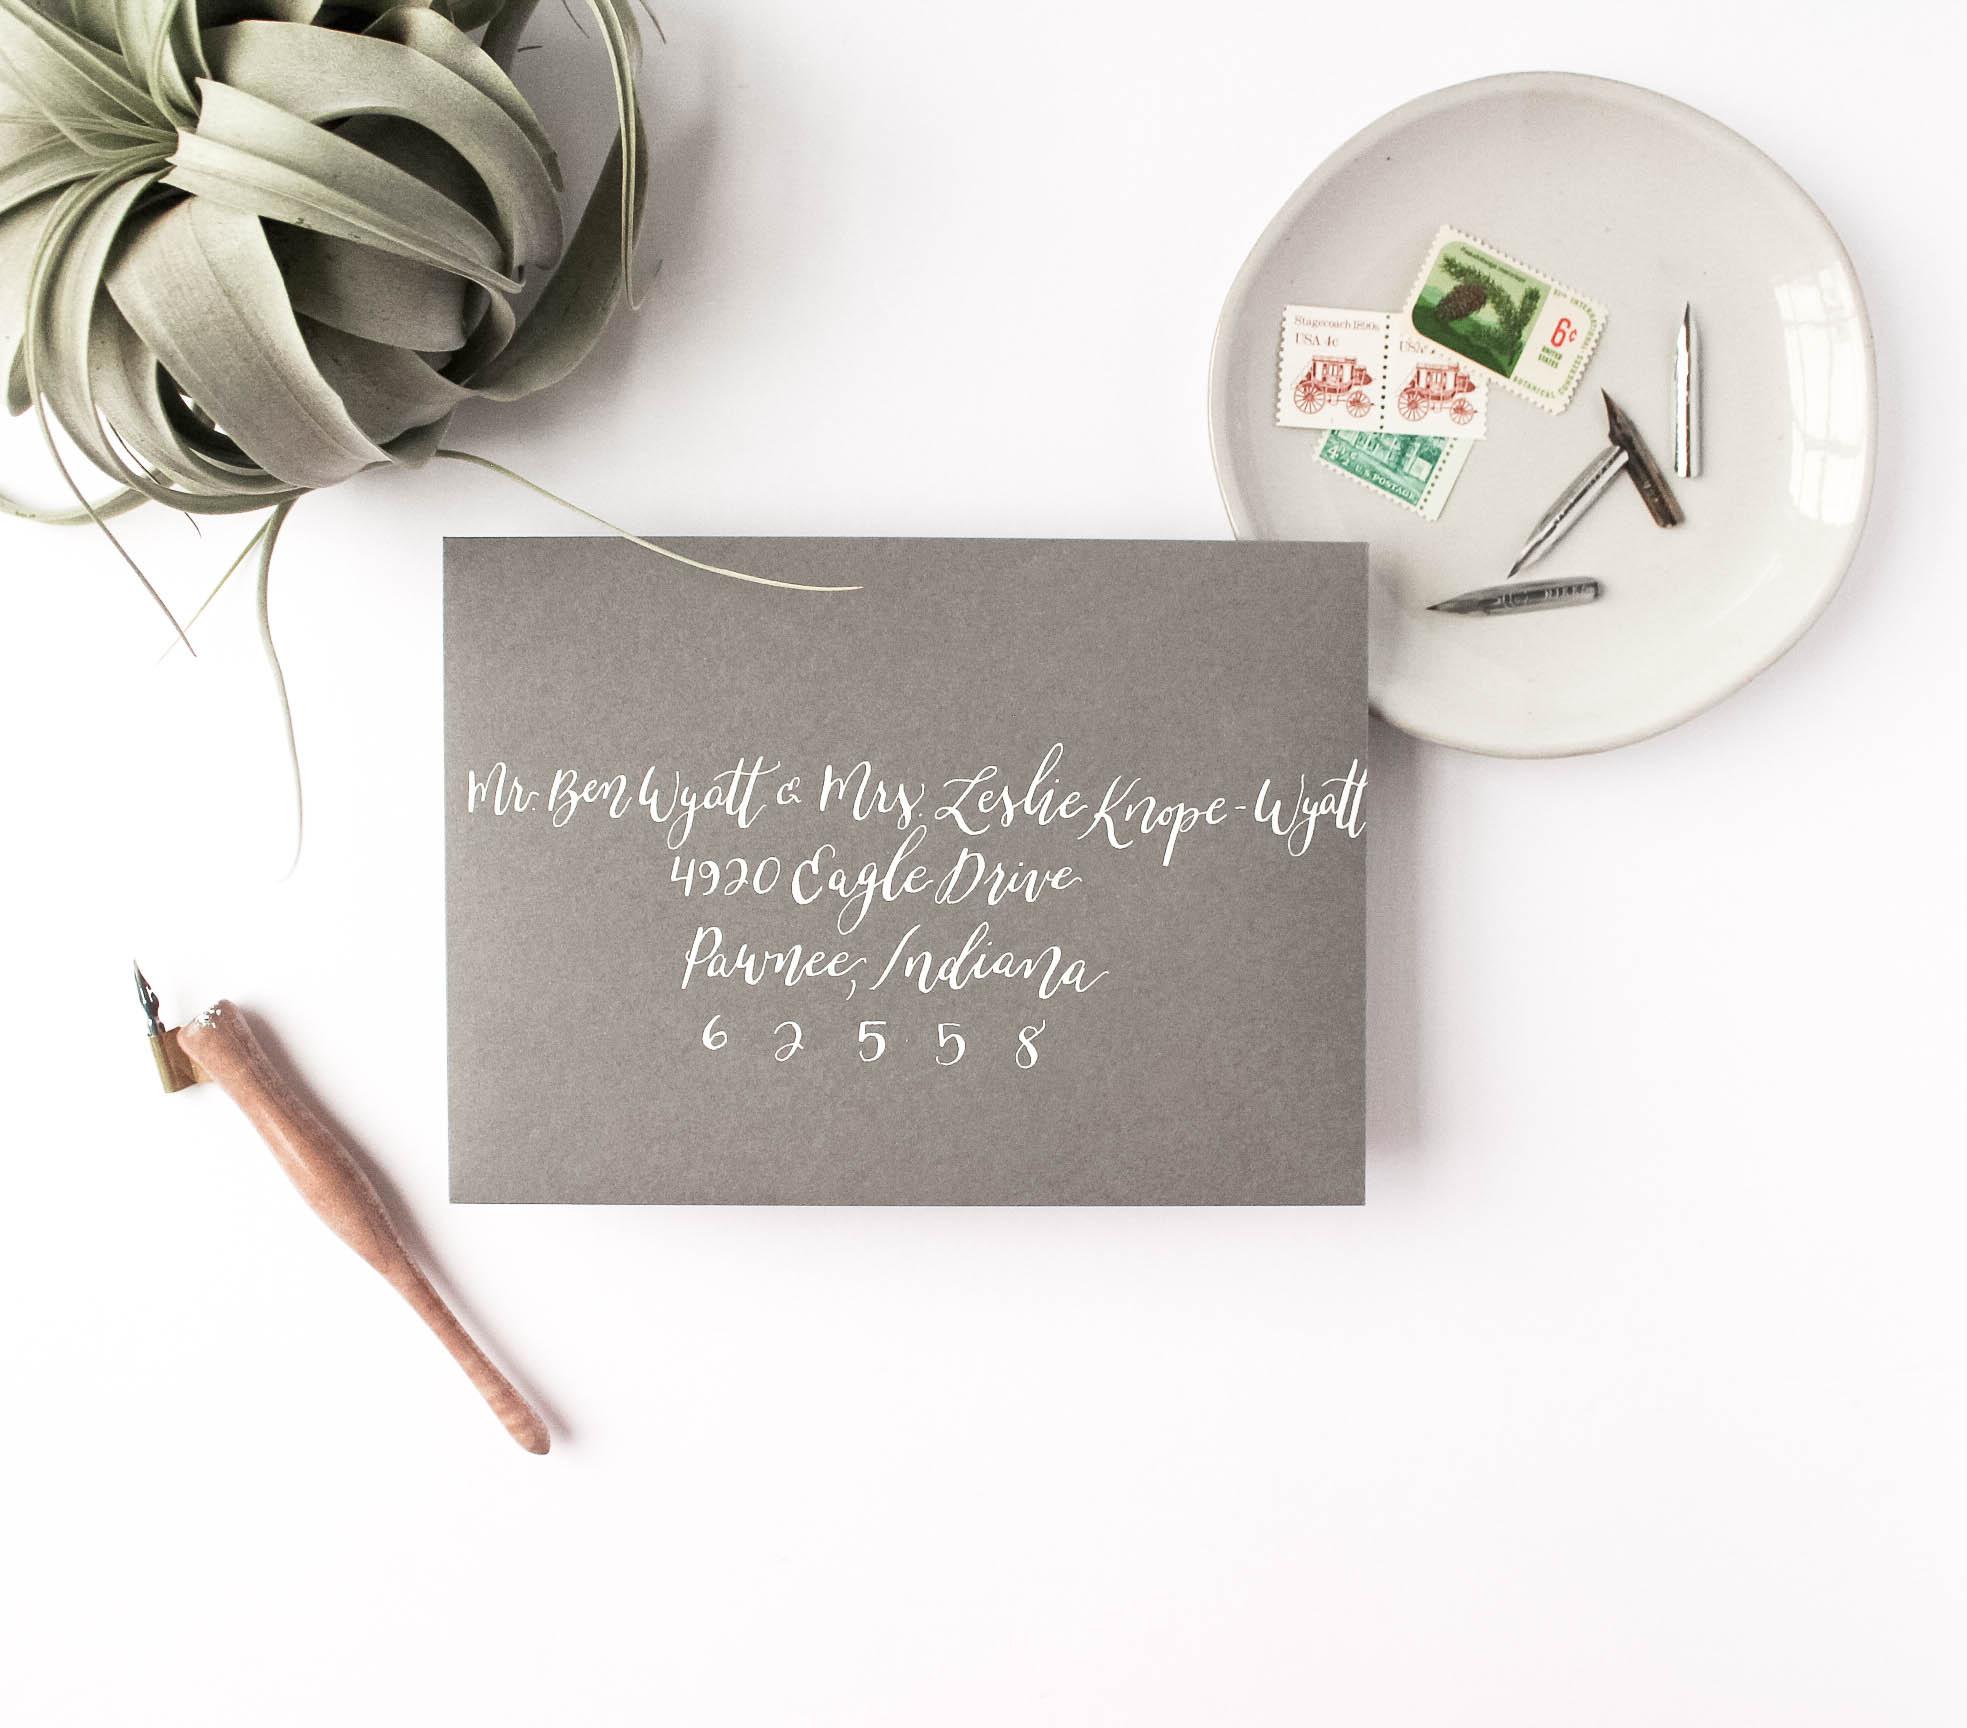 Wedding Envelope Etiquette - Tips for Addressing Envelopes - True North Paper Co